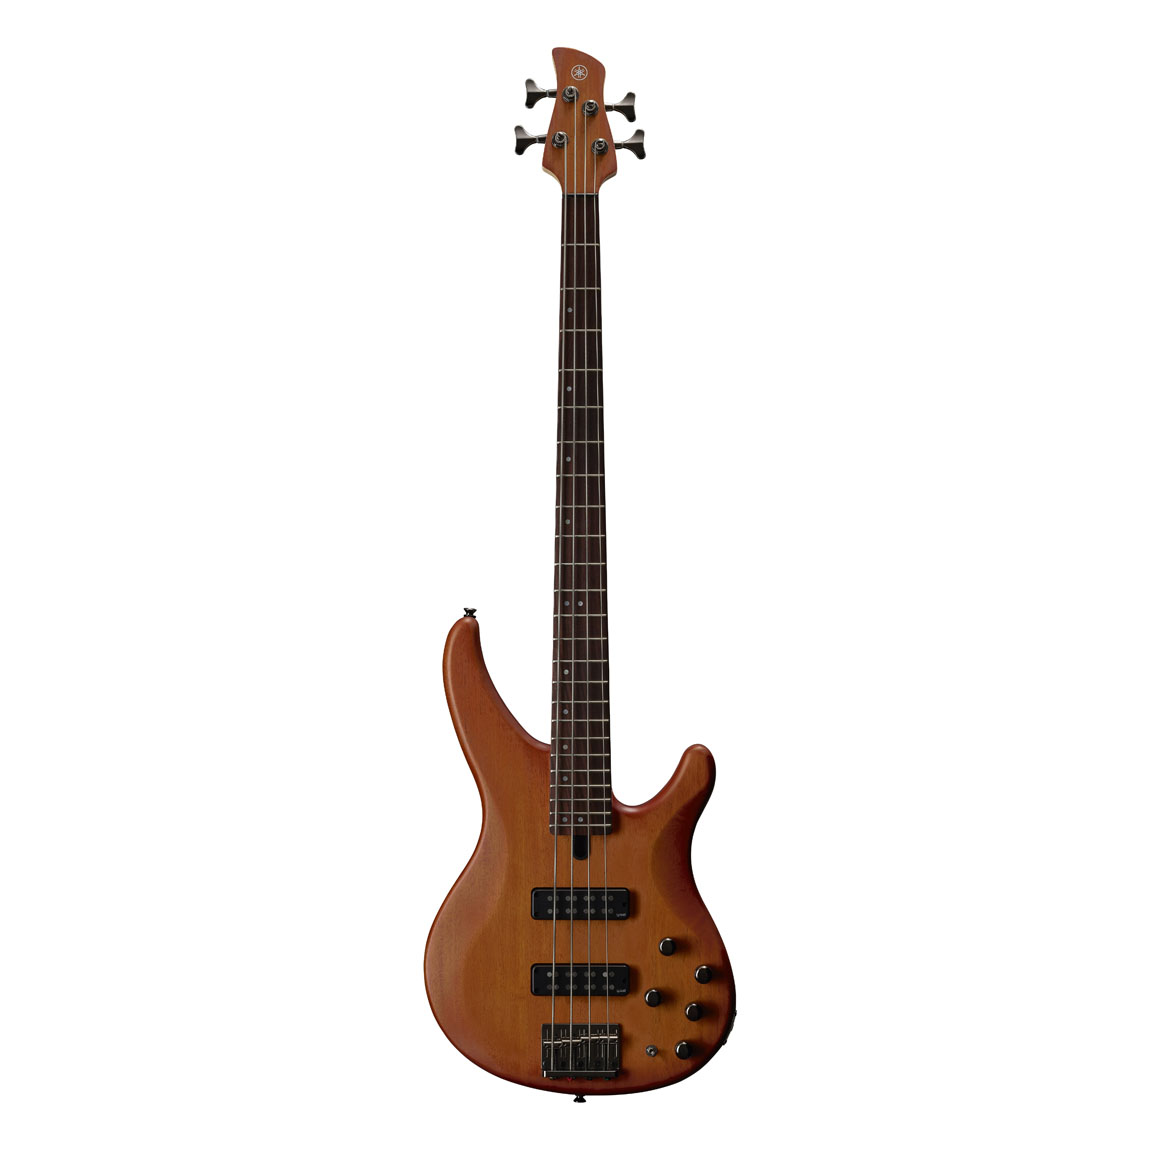 Yamaha TRBX504 4 Strings Electric Bass Guitar